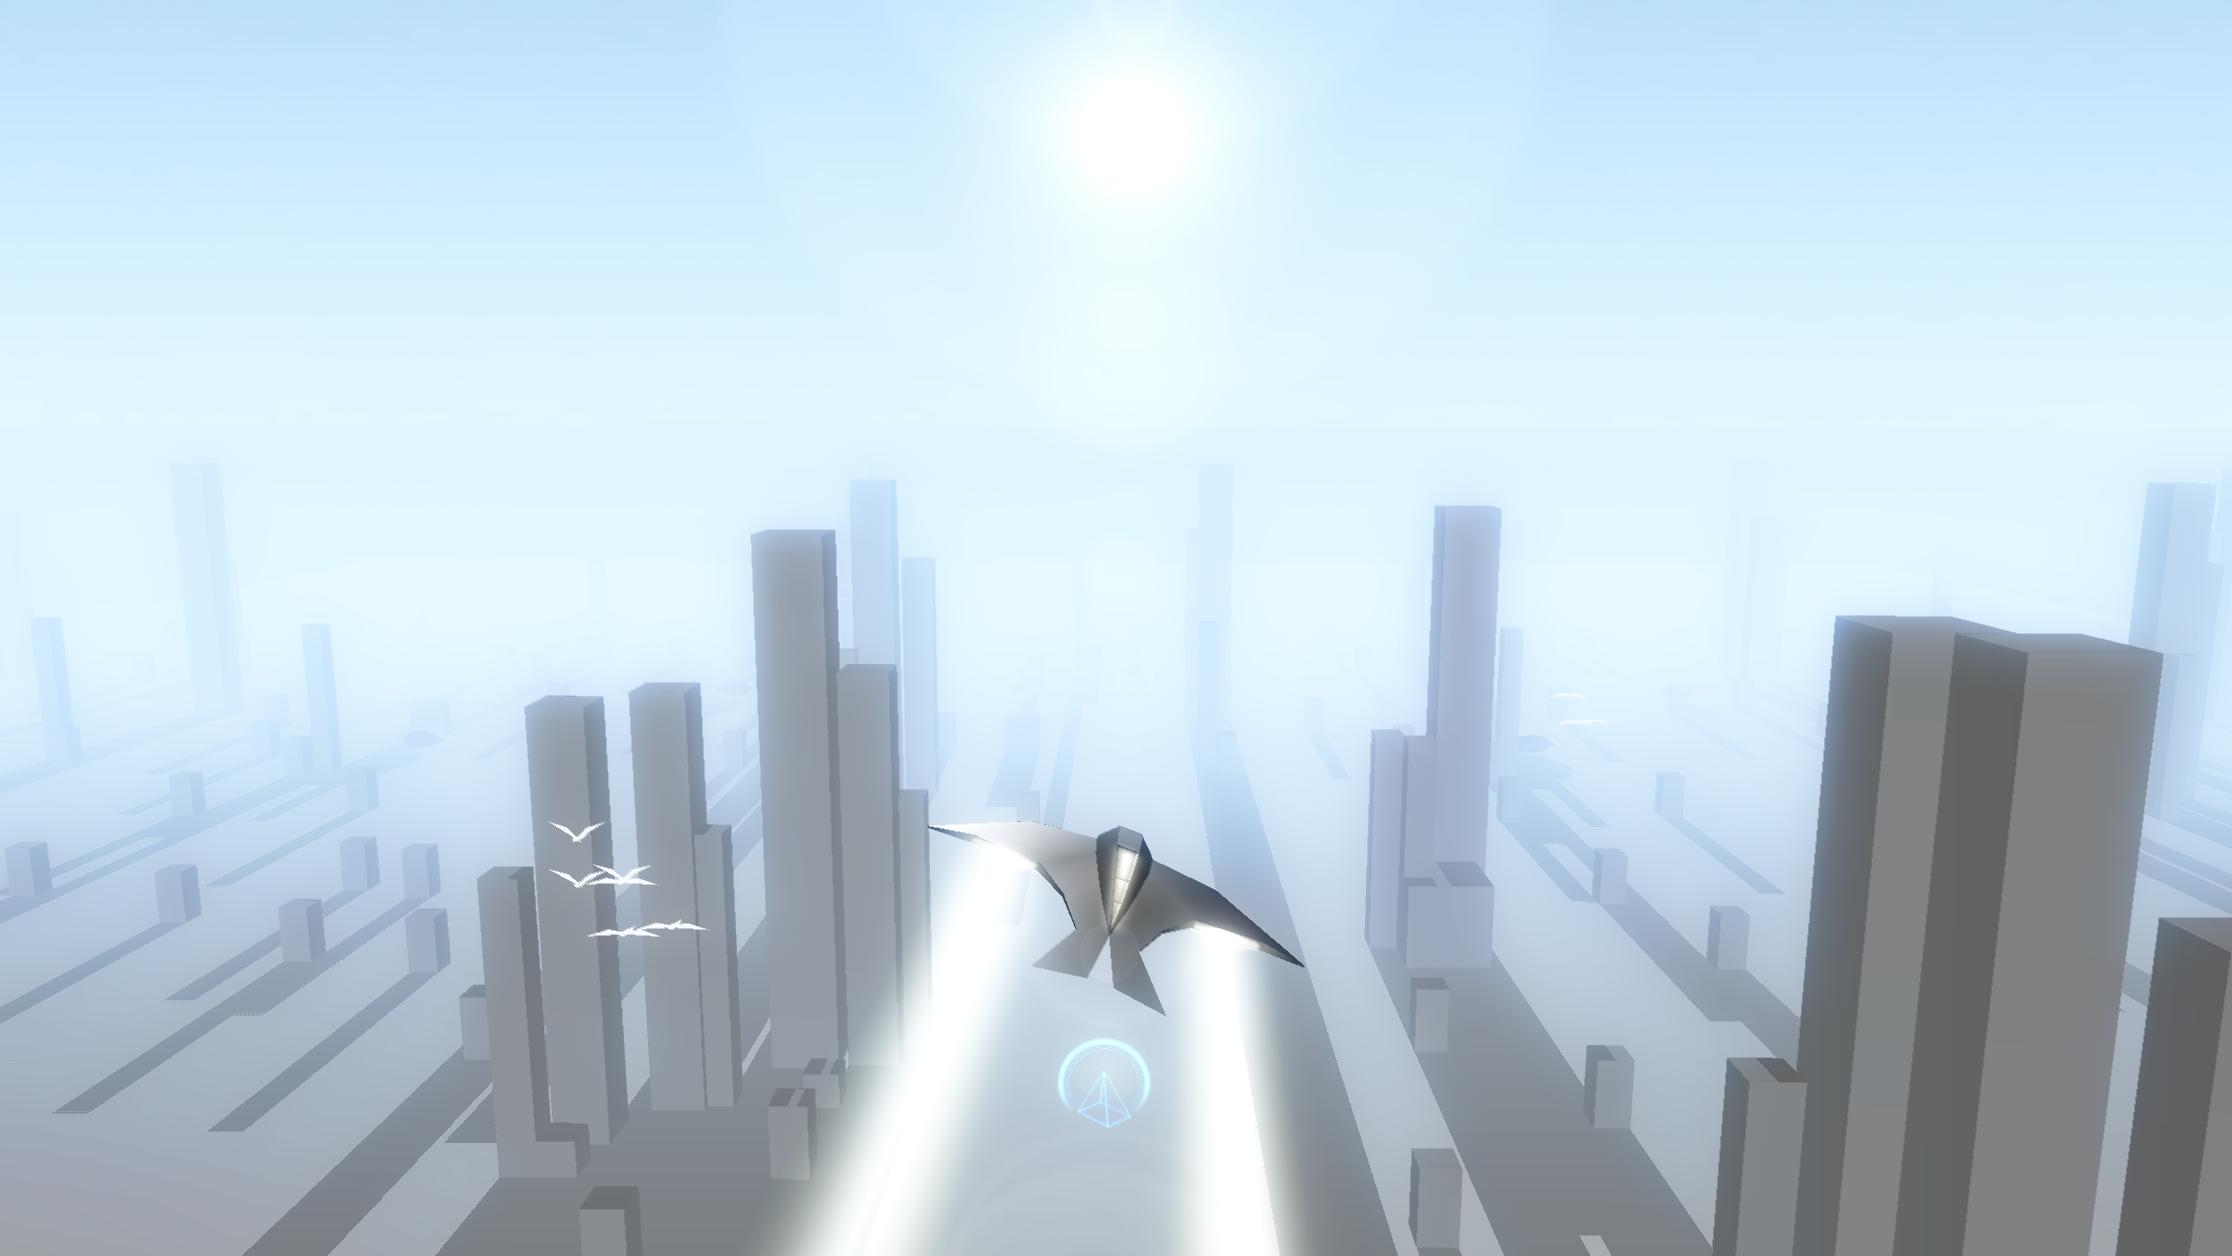 Game image Race the Sun